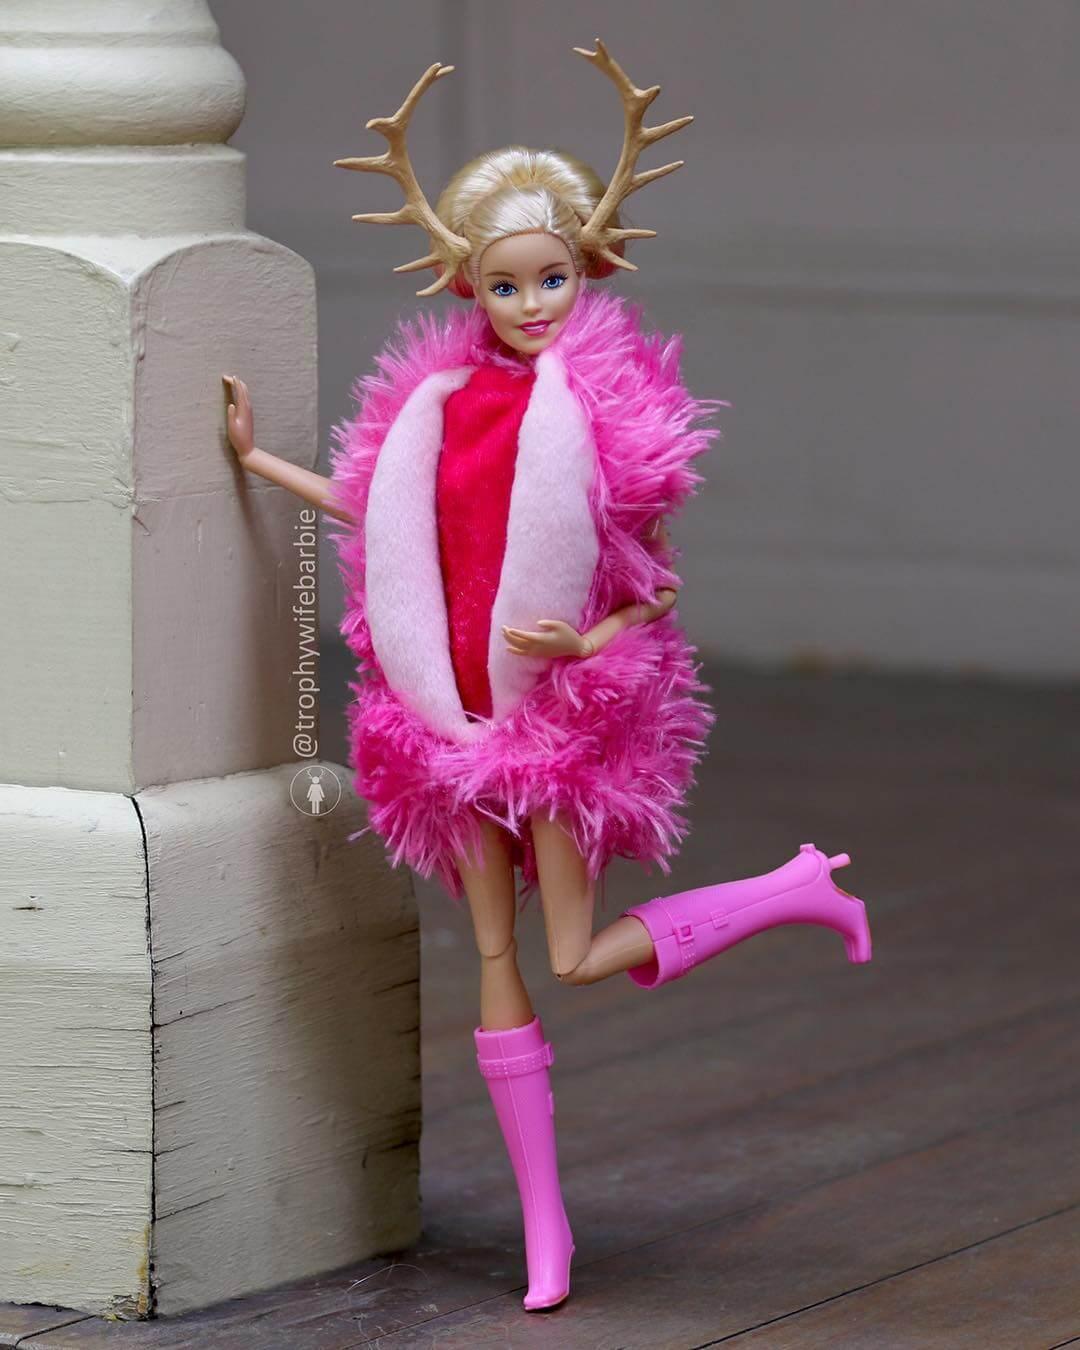 Annelies Hofmeyr Trophy Wife Barbie - For Creative Girls